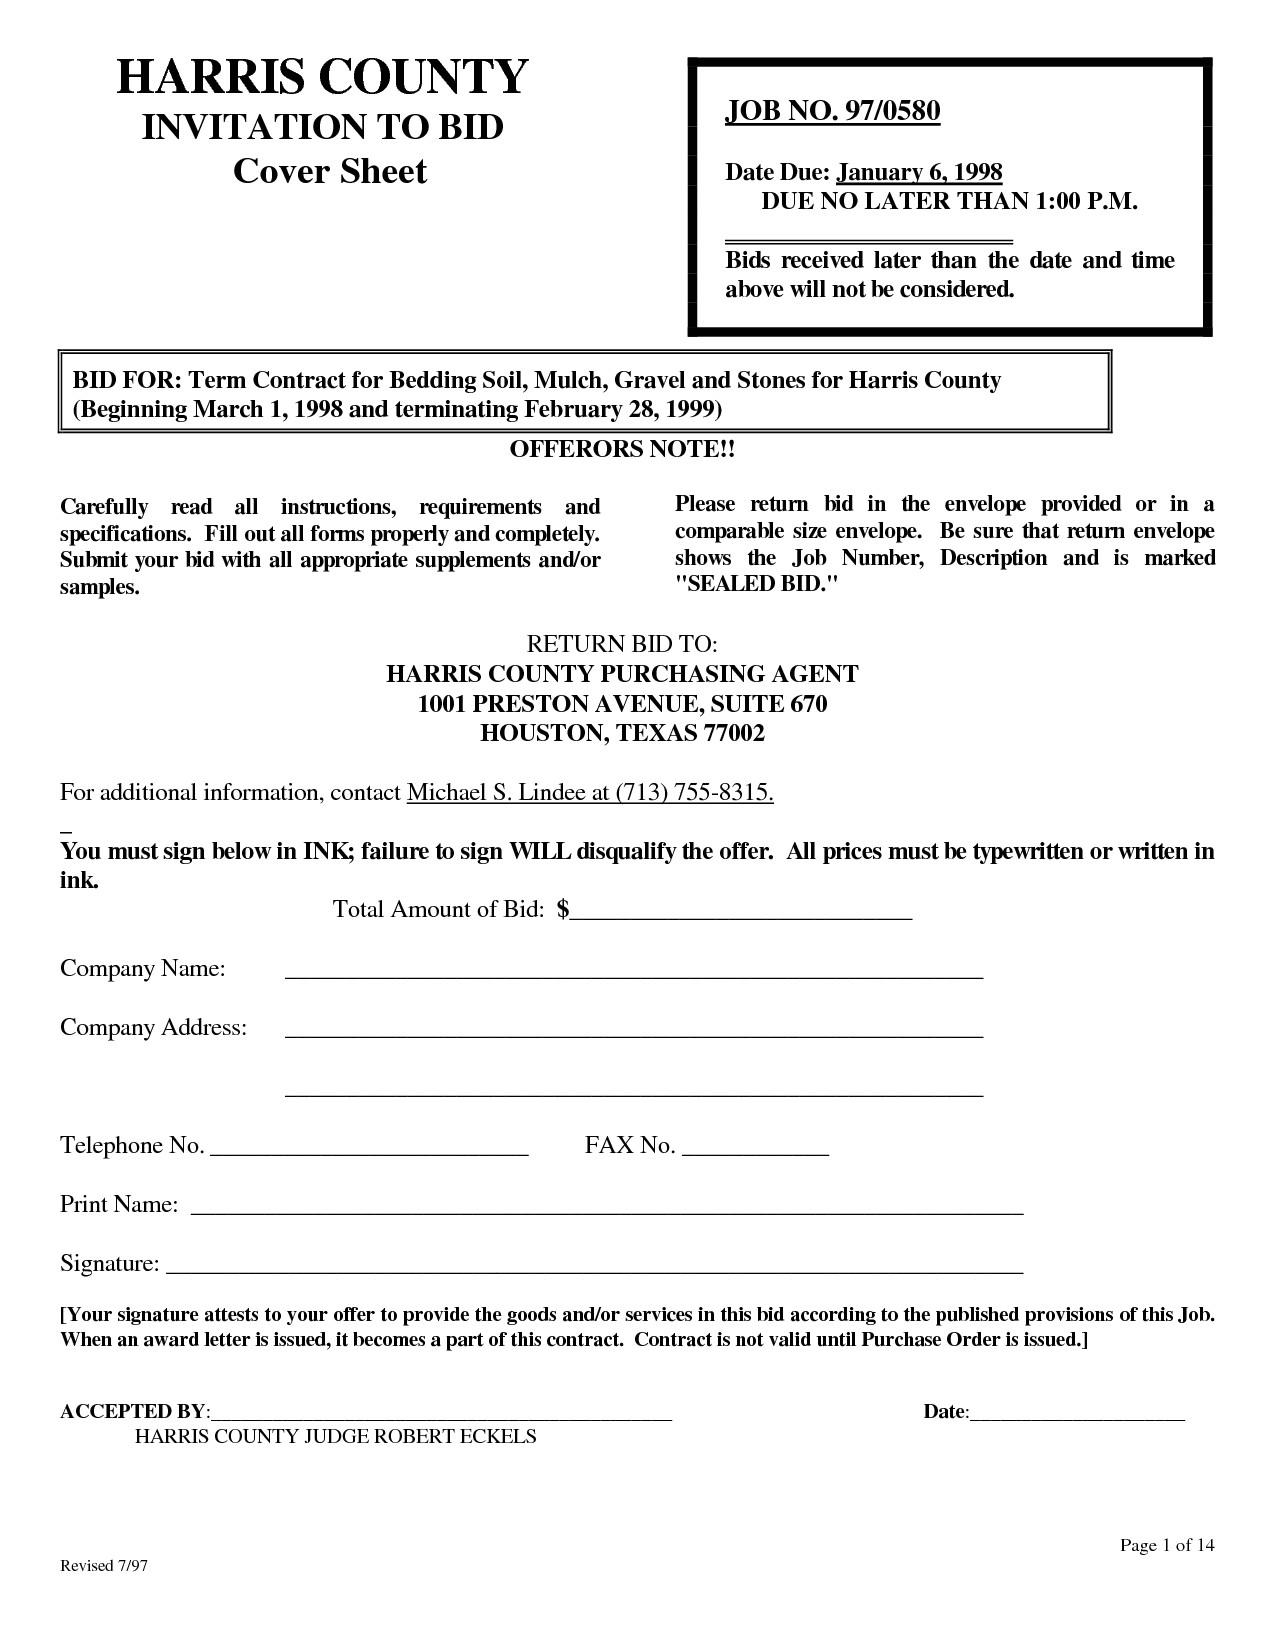 post landscaping job proposal template 816348